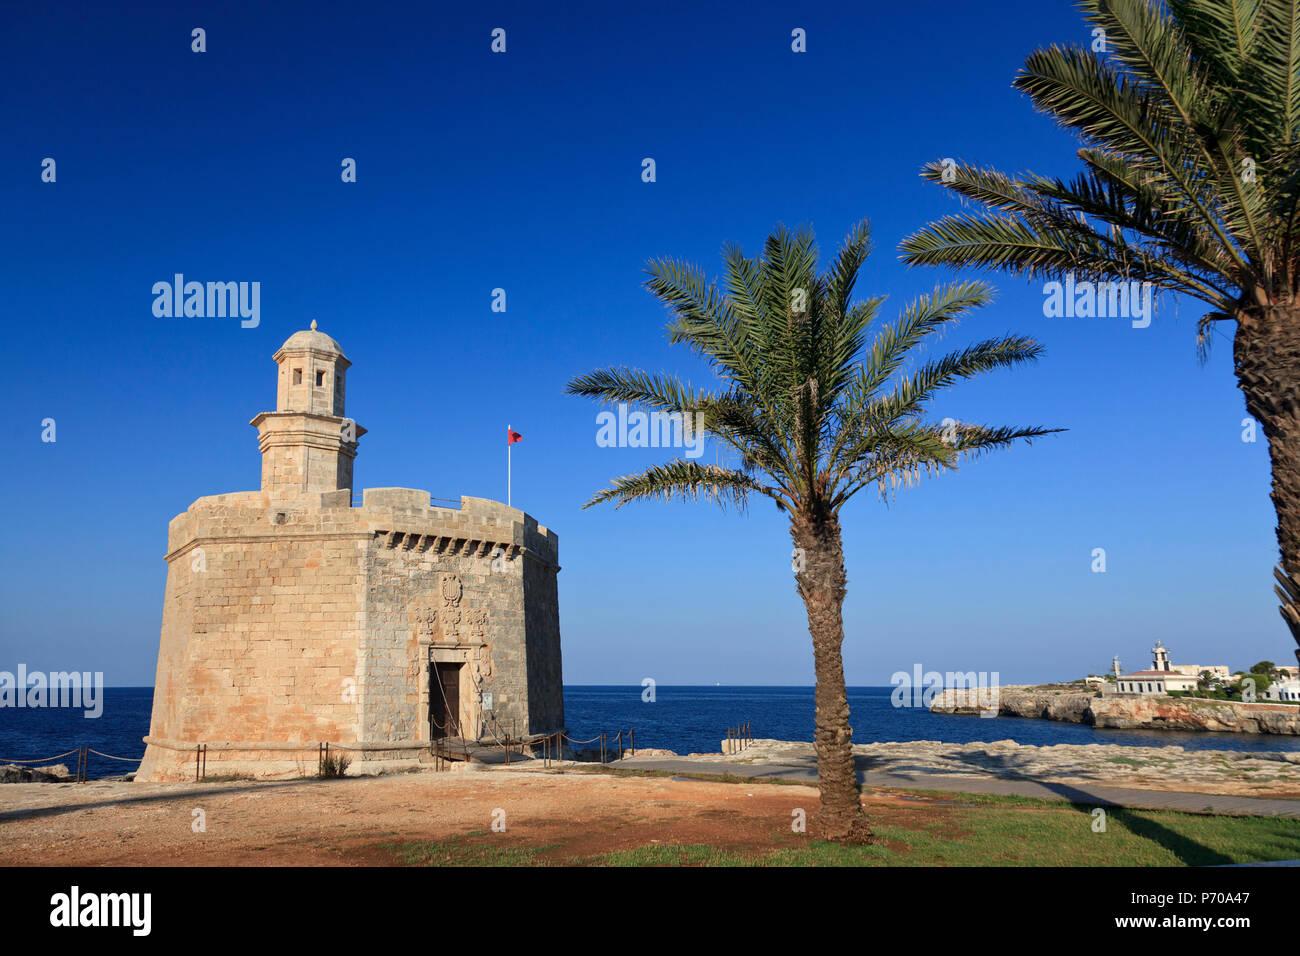 Spain, Balearic Islands, Menorca, Ciutadella, Old Town, Sant Nicolau Castle - Stock Image